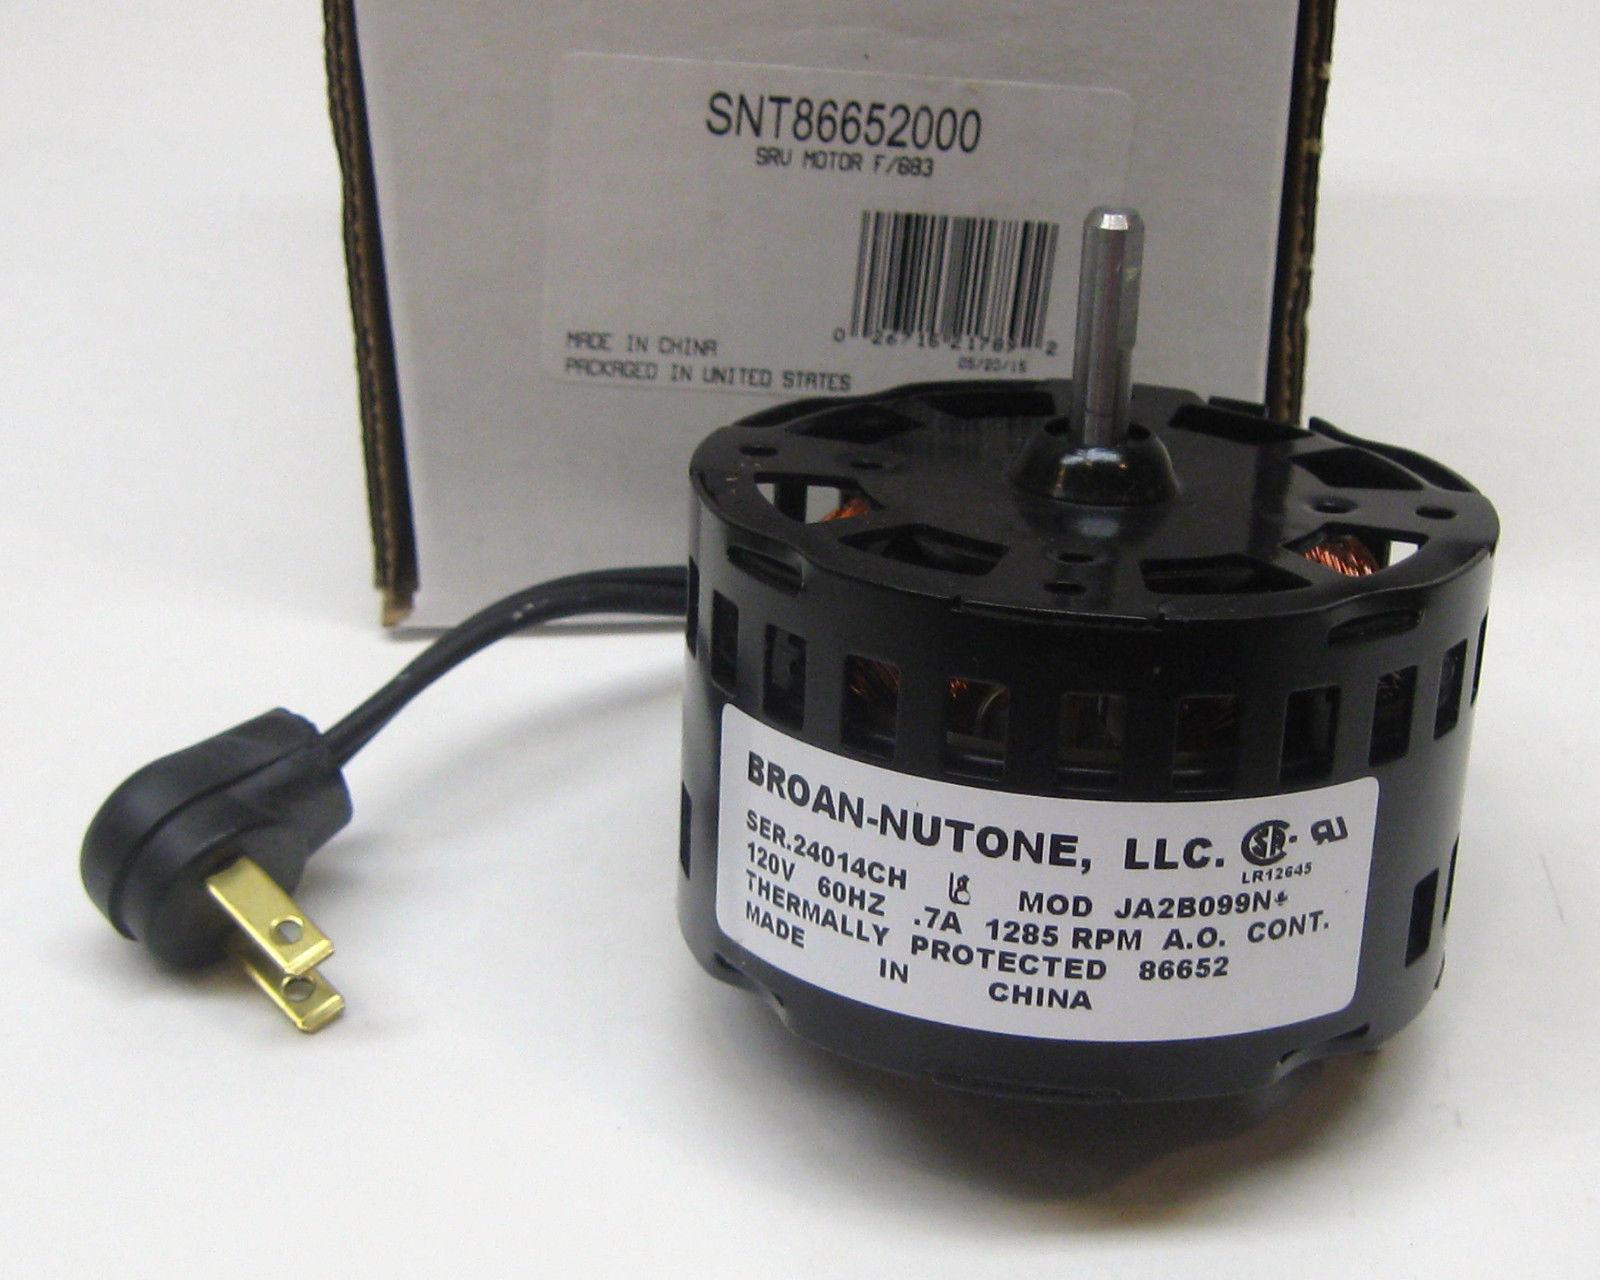 details about broan nutone bathroom exhaust vent fan motor 86652000 ja2b099n 86652